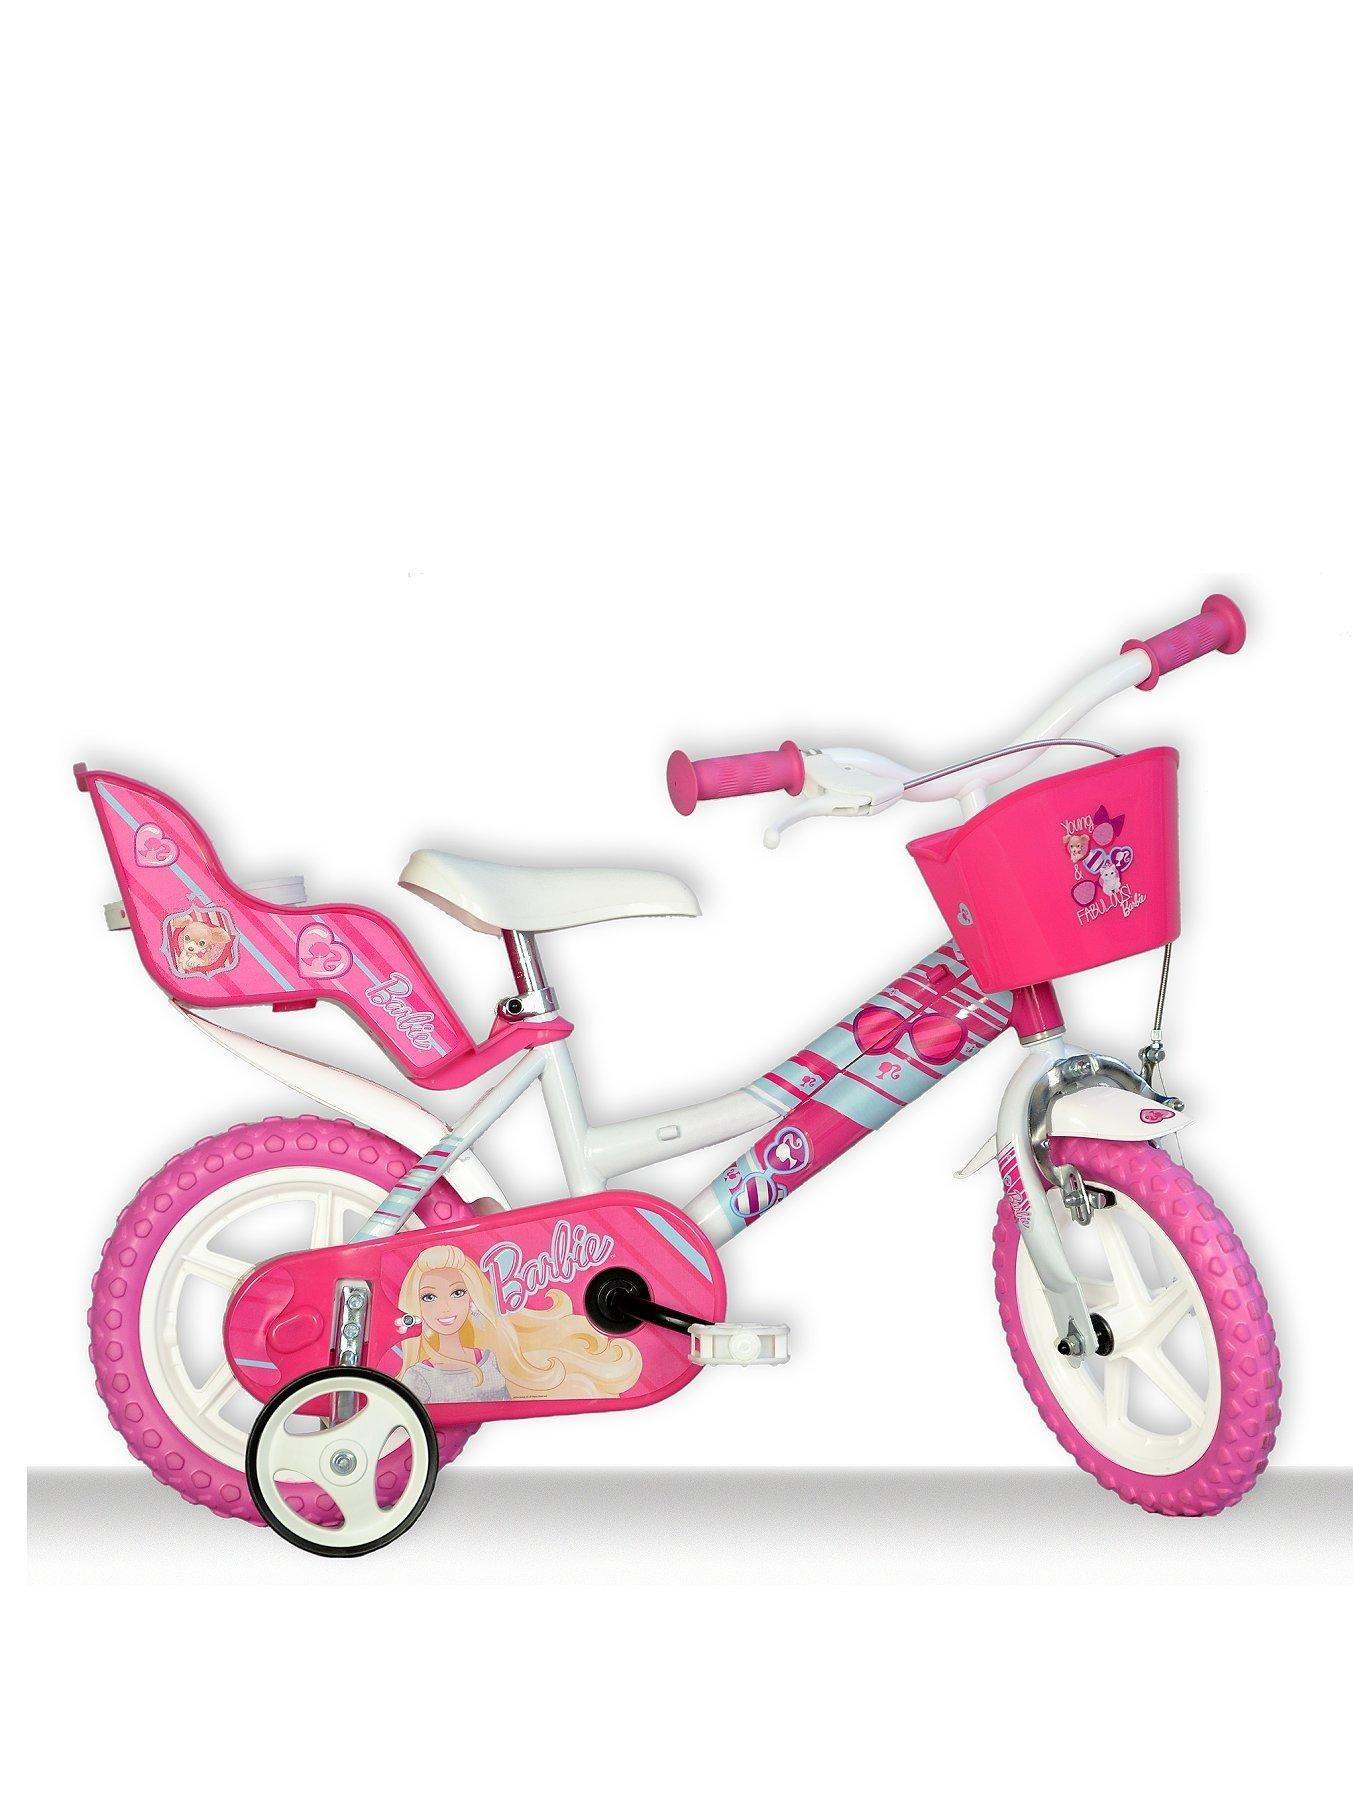 Compare prices for Barbie 12 Inch Bike